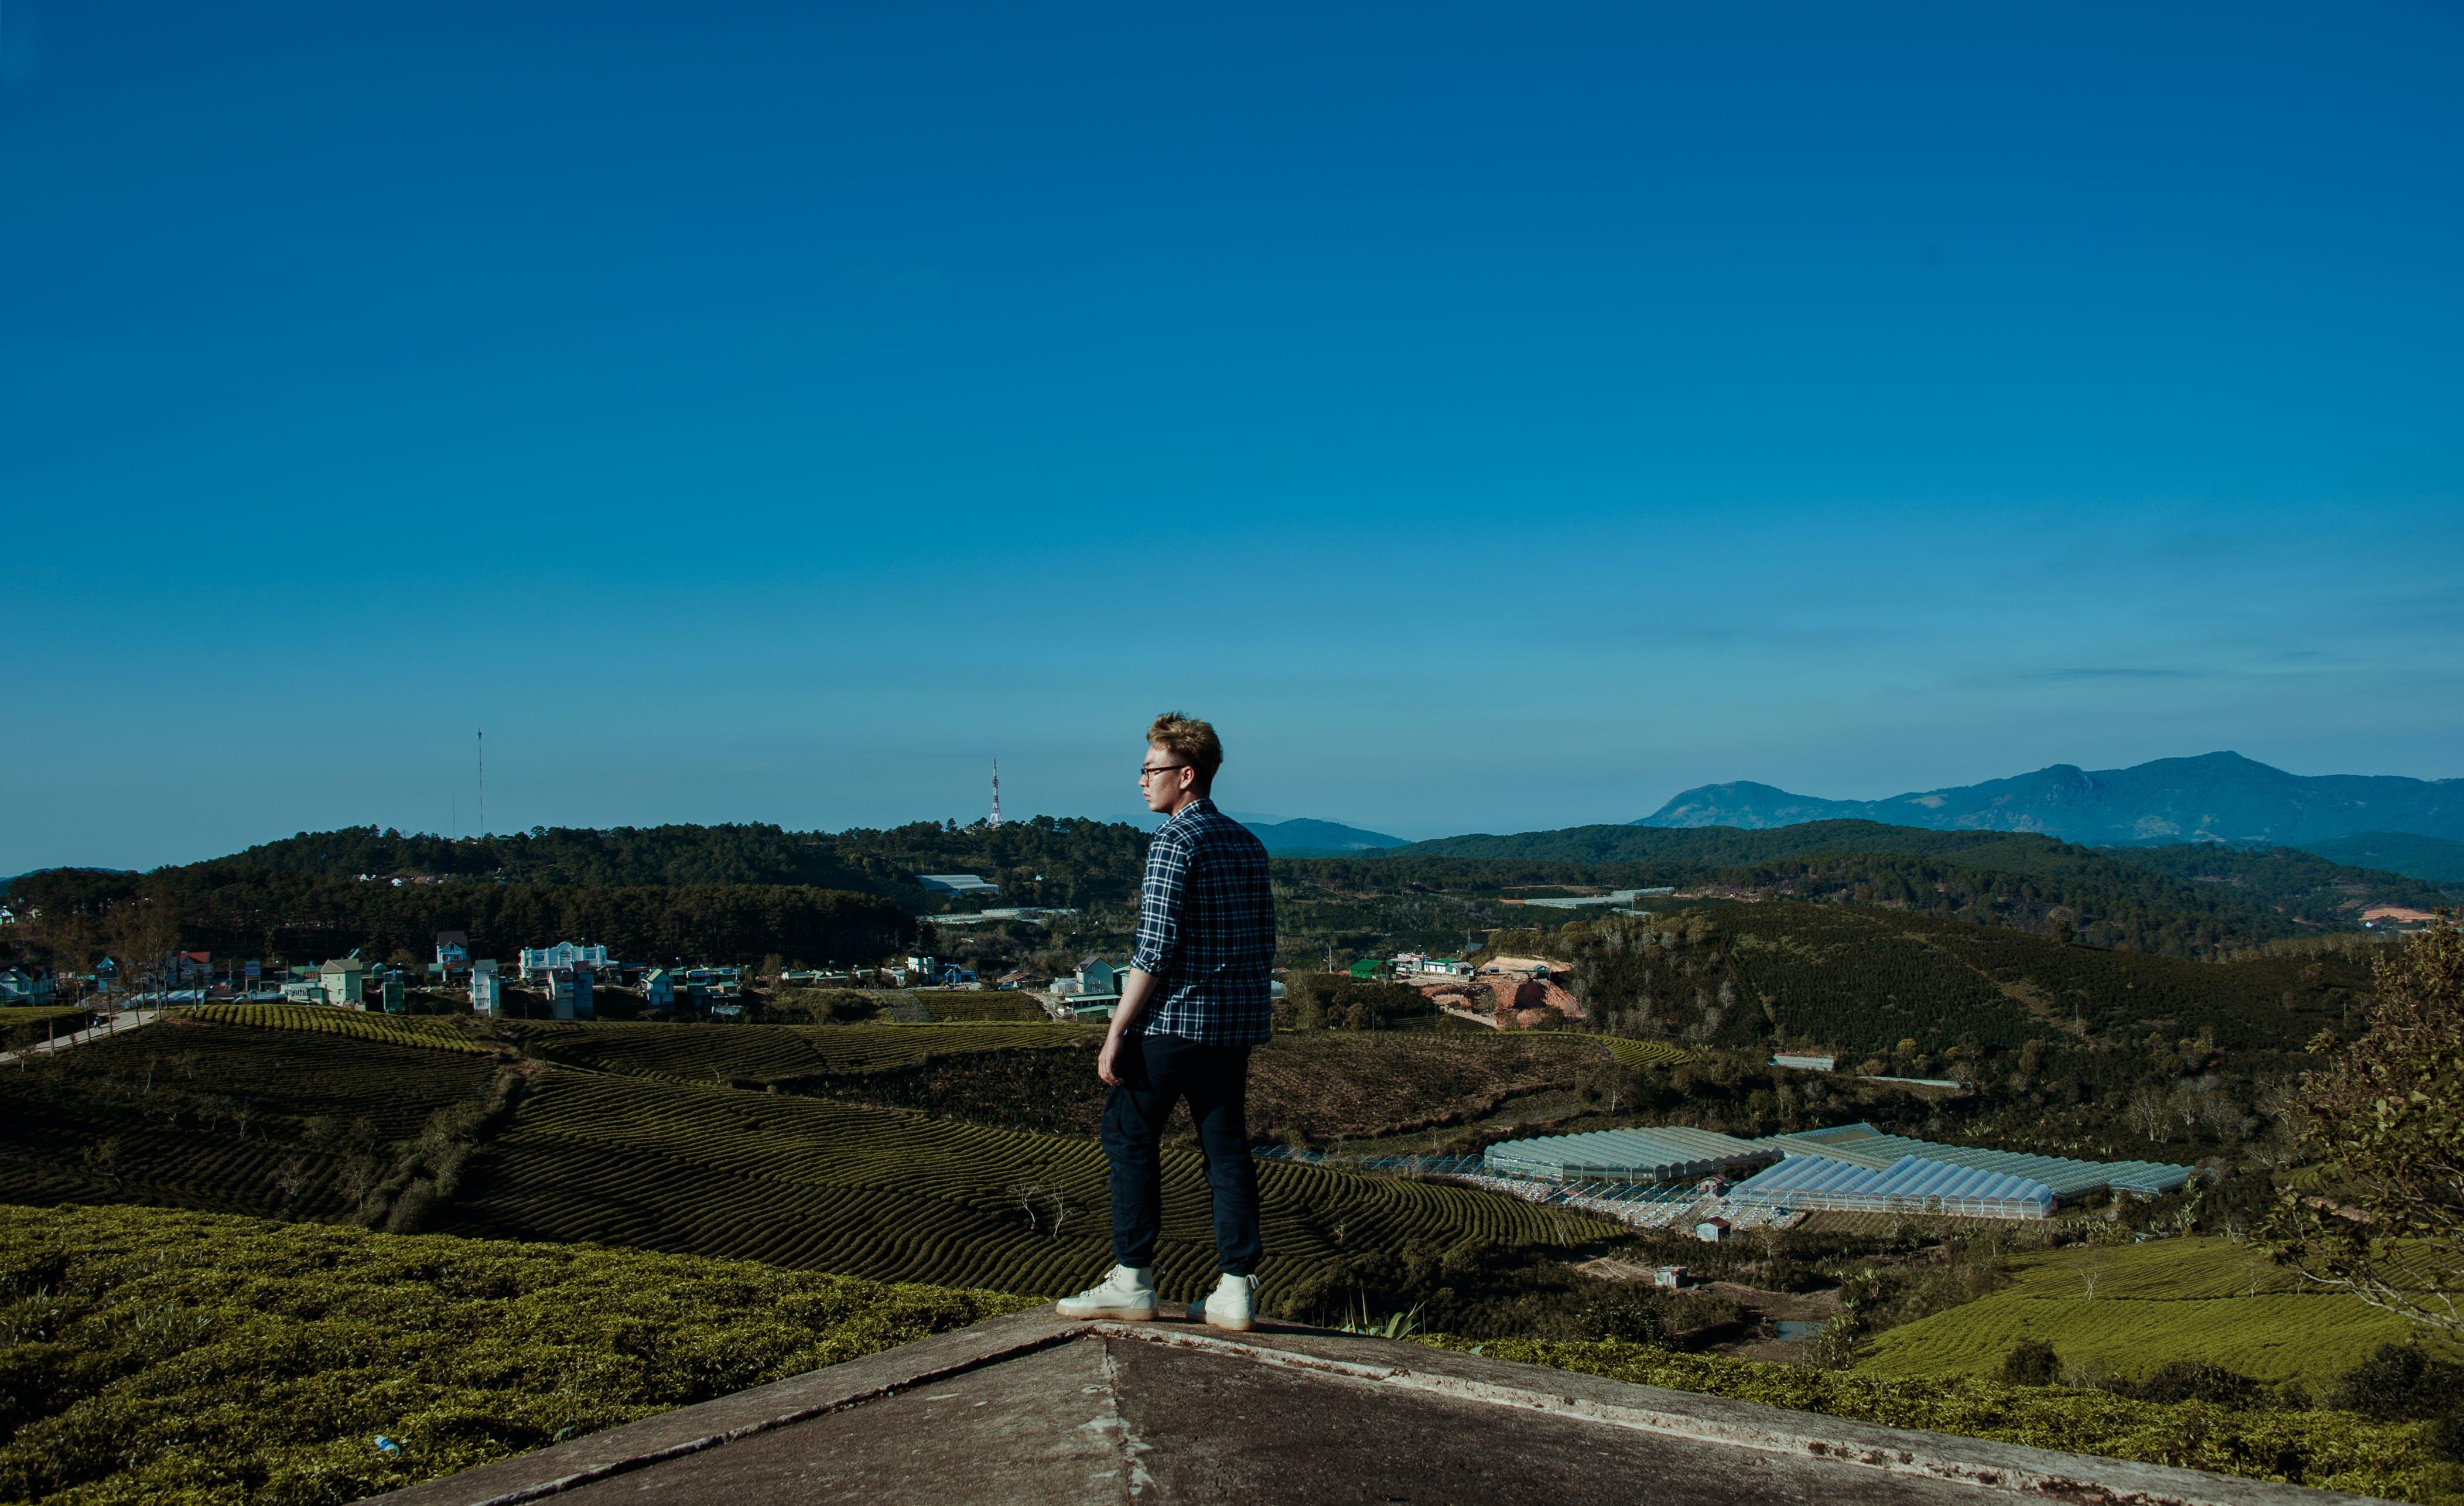 Man Wearing Blue and Gray Gingham Dress Shirt Standing in Green Grass Field